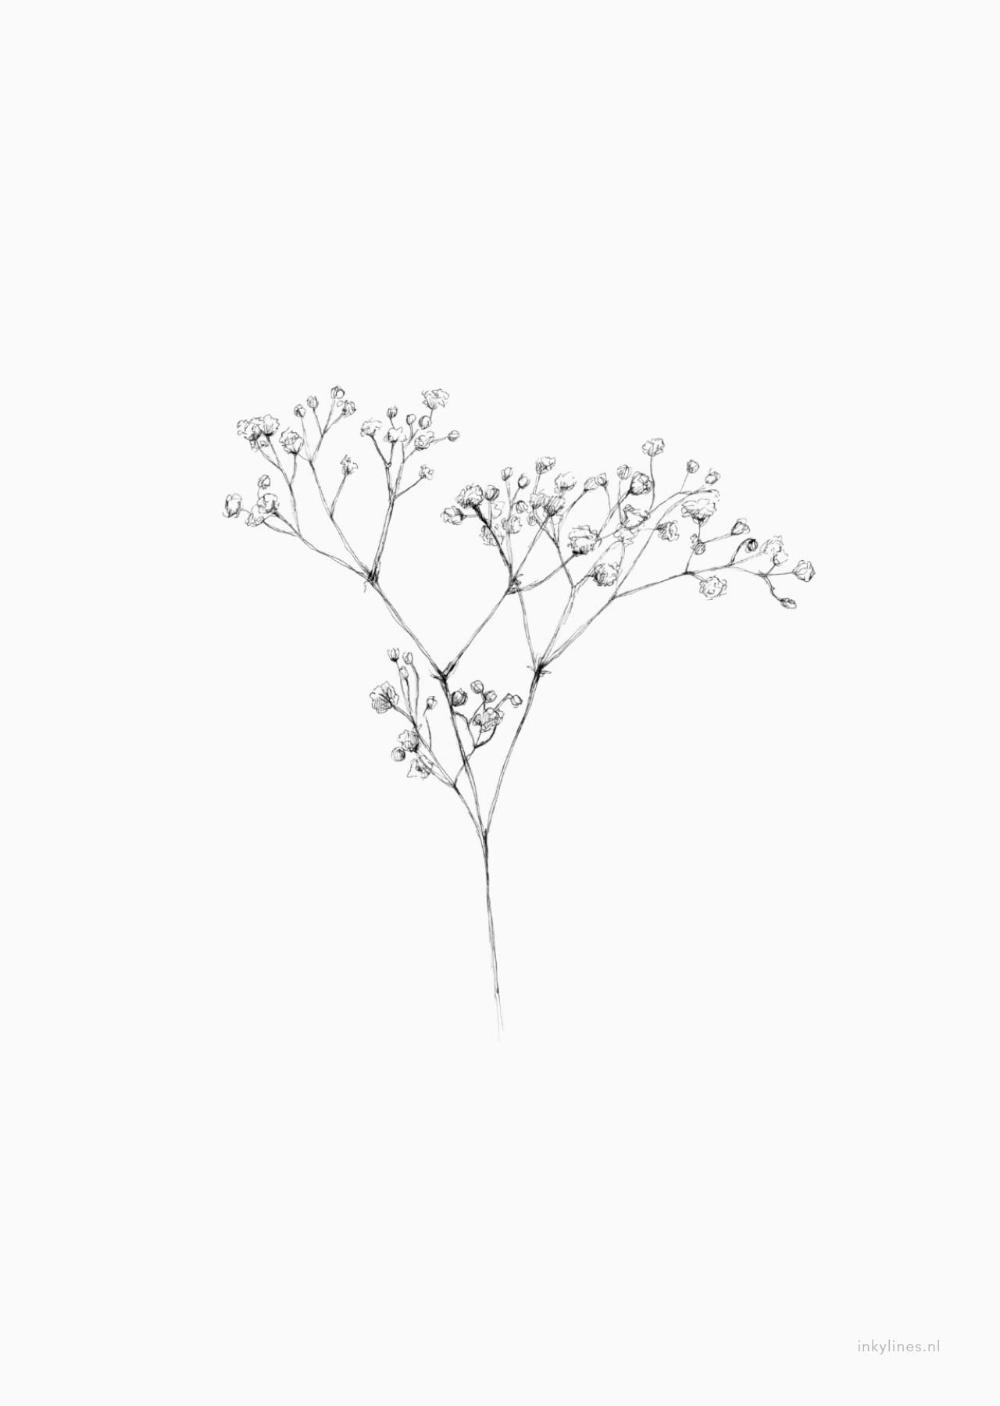 Flowers Gypsophila In 2020 Baby Breath Tattoo Gypsophila Tattoo Flower Illustration